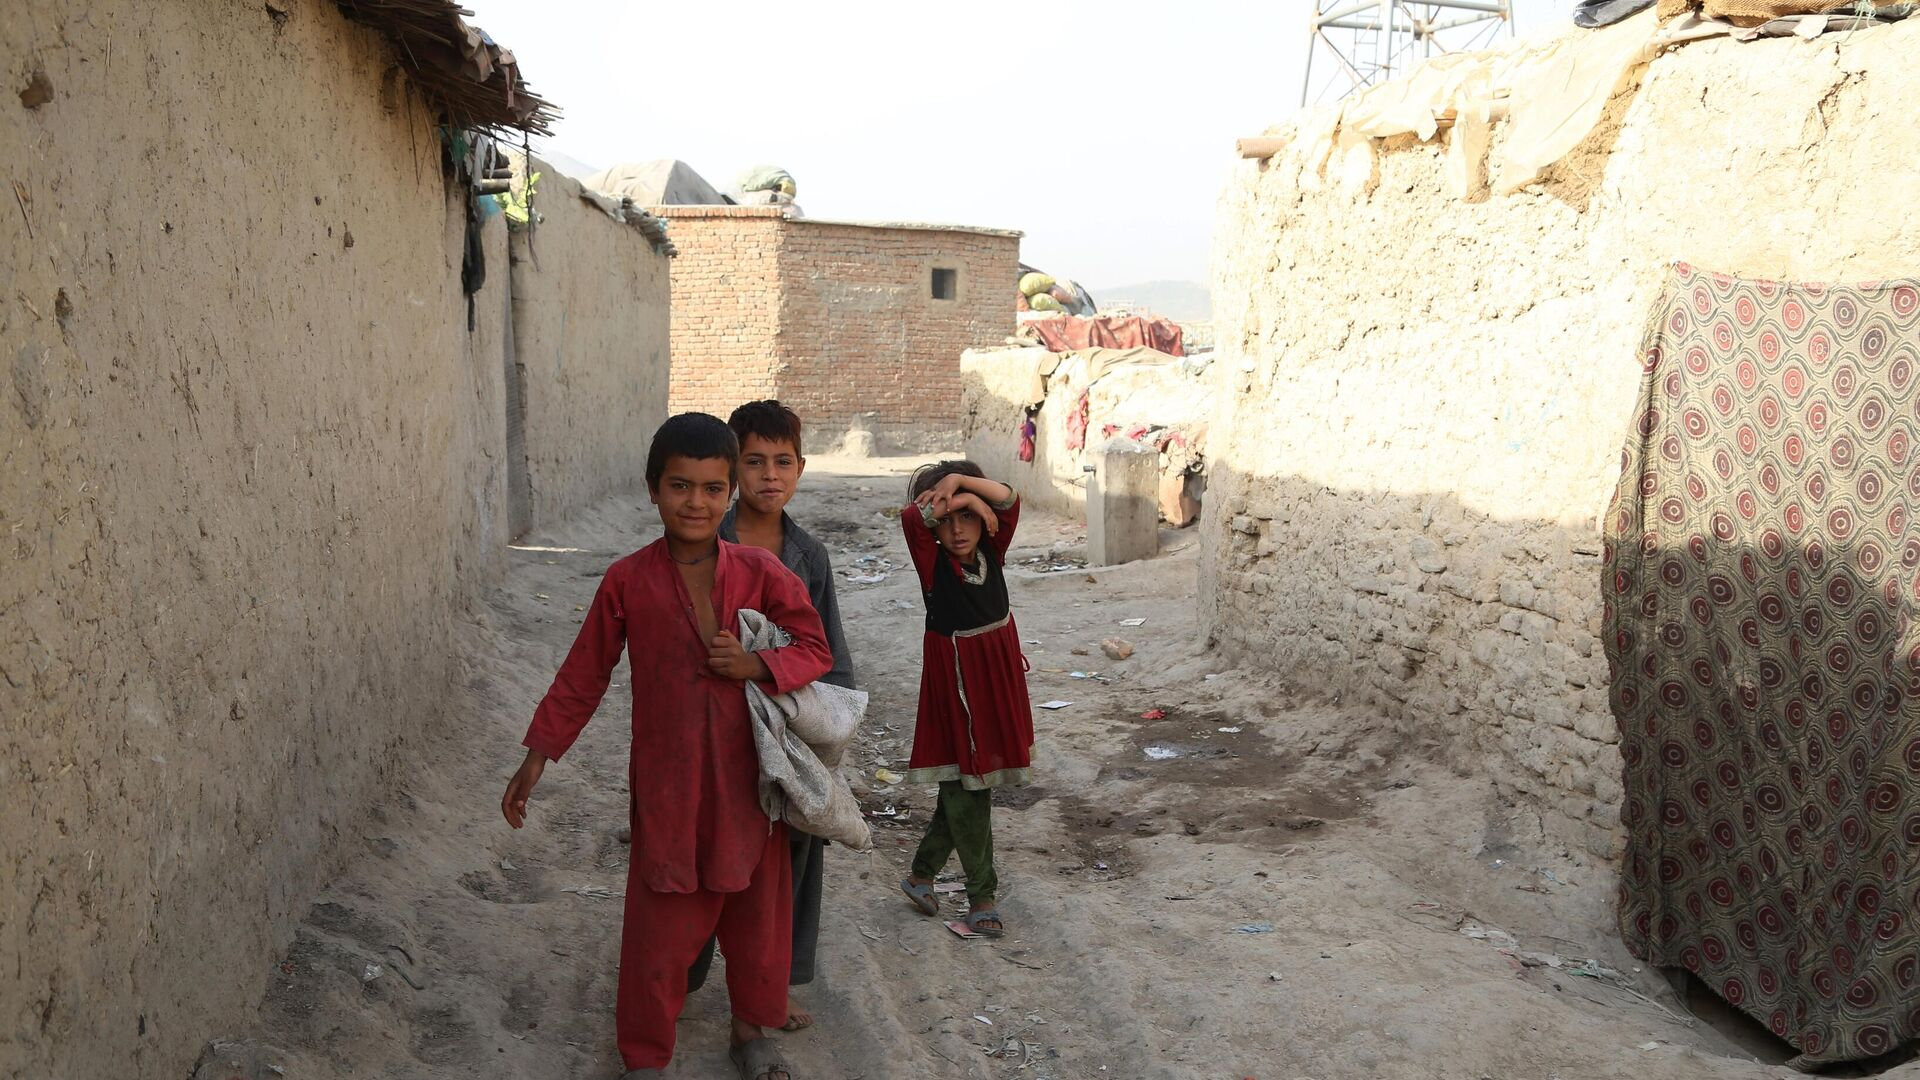 Bambini afghani, Kabul - Sputnik Italia, 1920, 25.08.2021